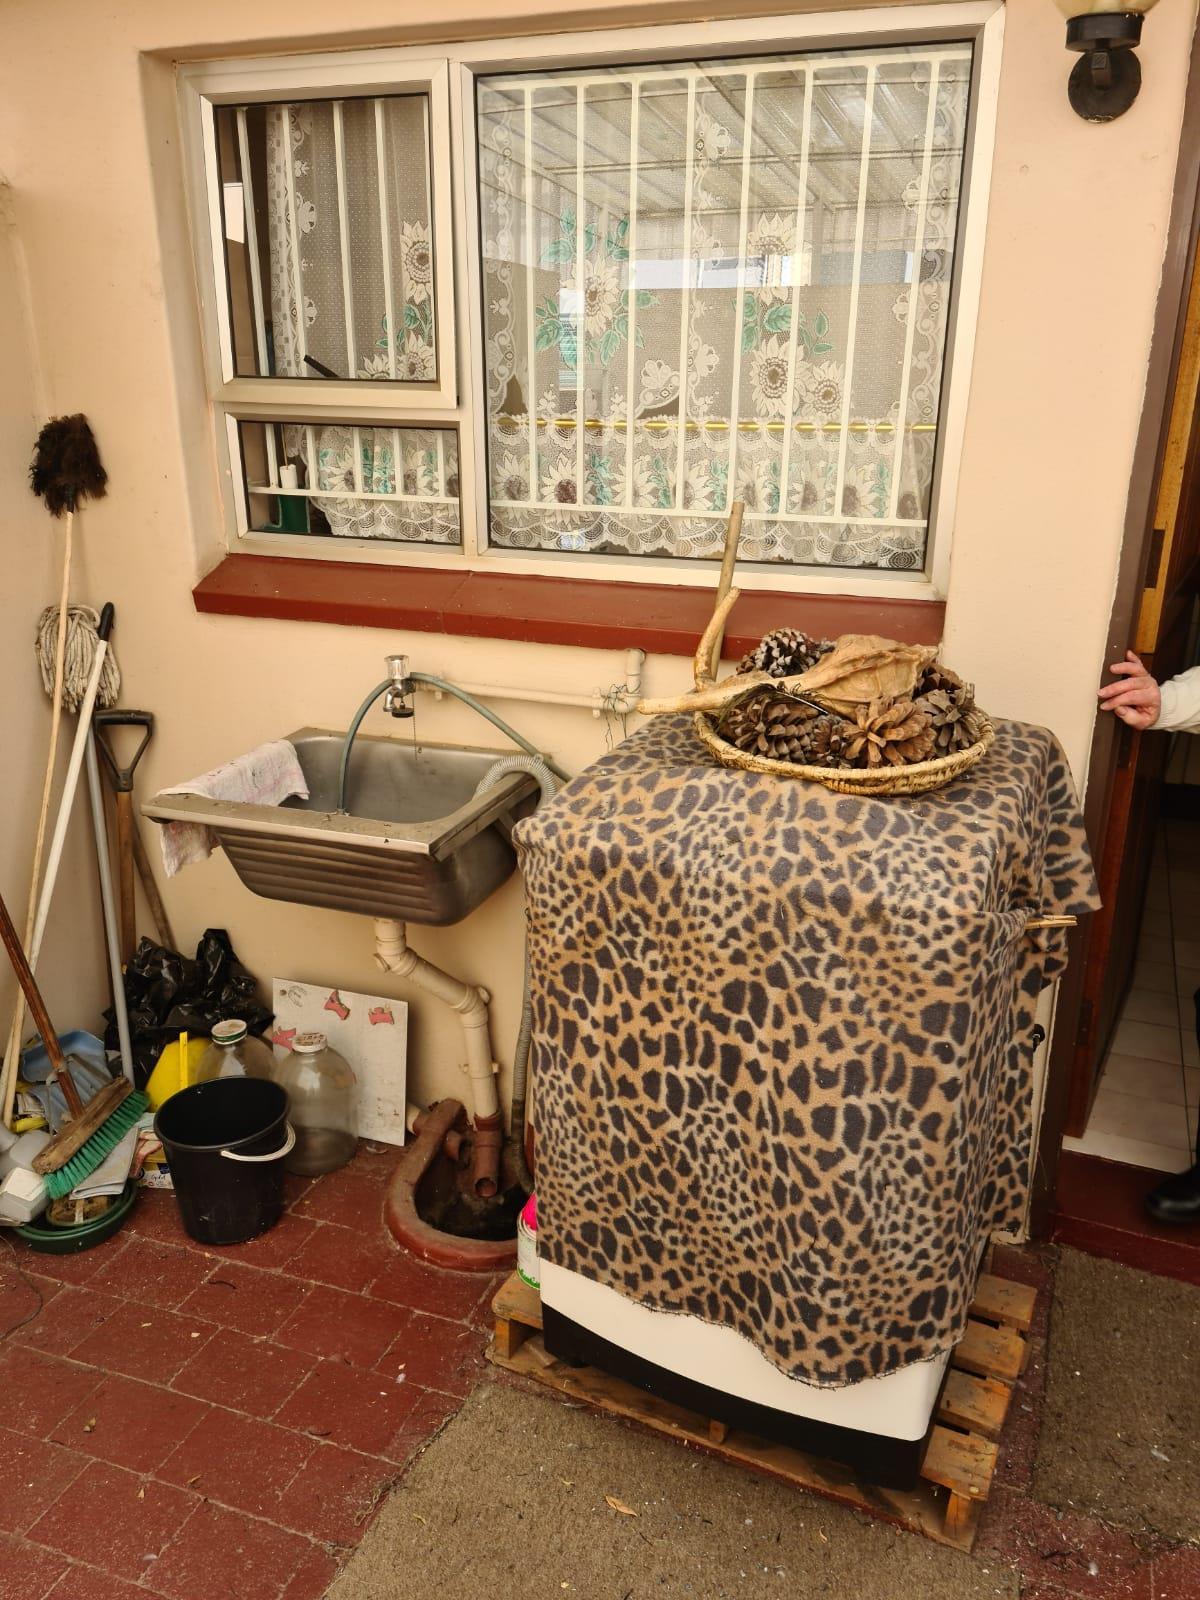 1 Bedroom Townhouse For Sale in Terenure